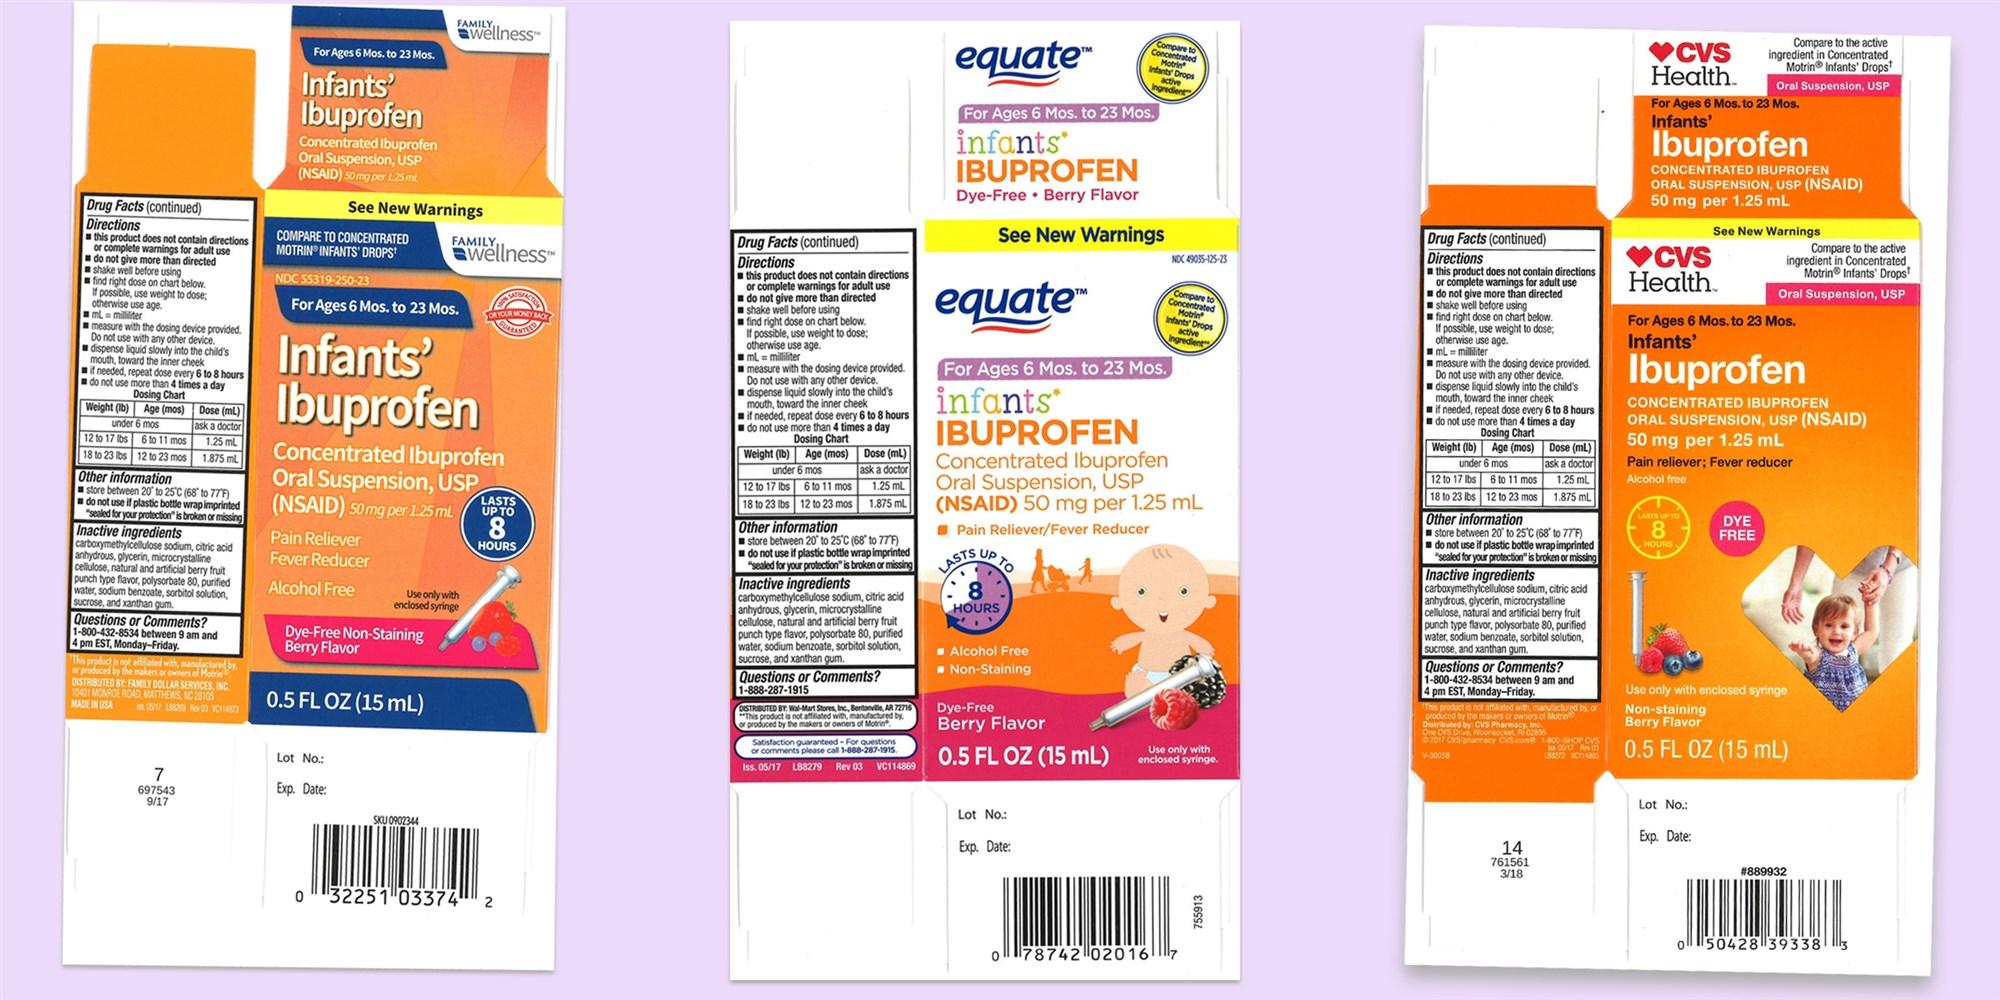 ibuprofen-recall-today-main-181206_02c86ae00ea6be6386fa2b1083222cbd.fit-2000w_1544126115987.jpg